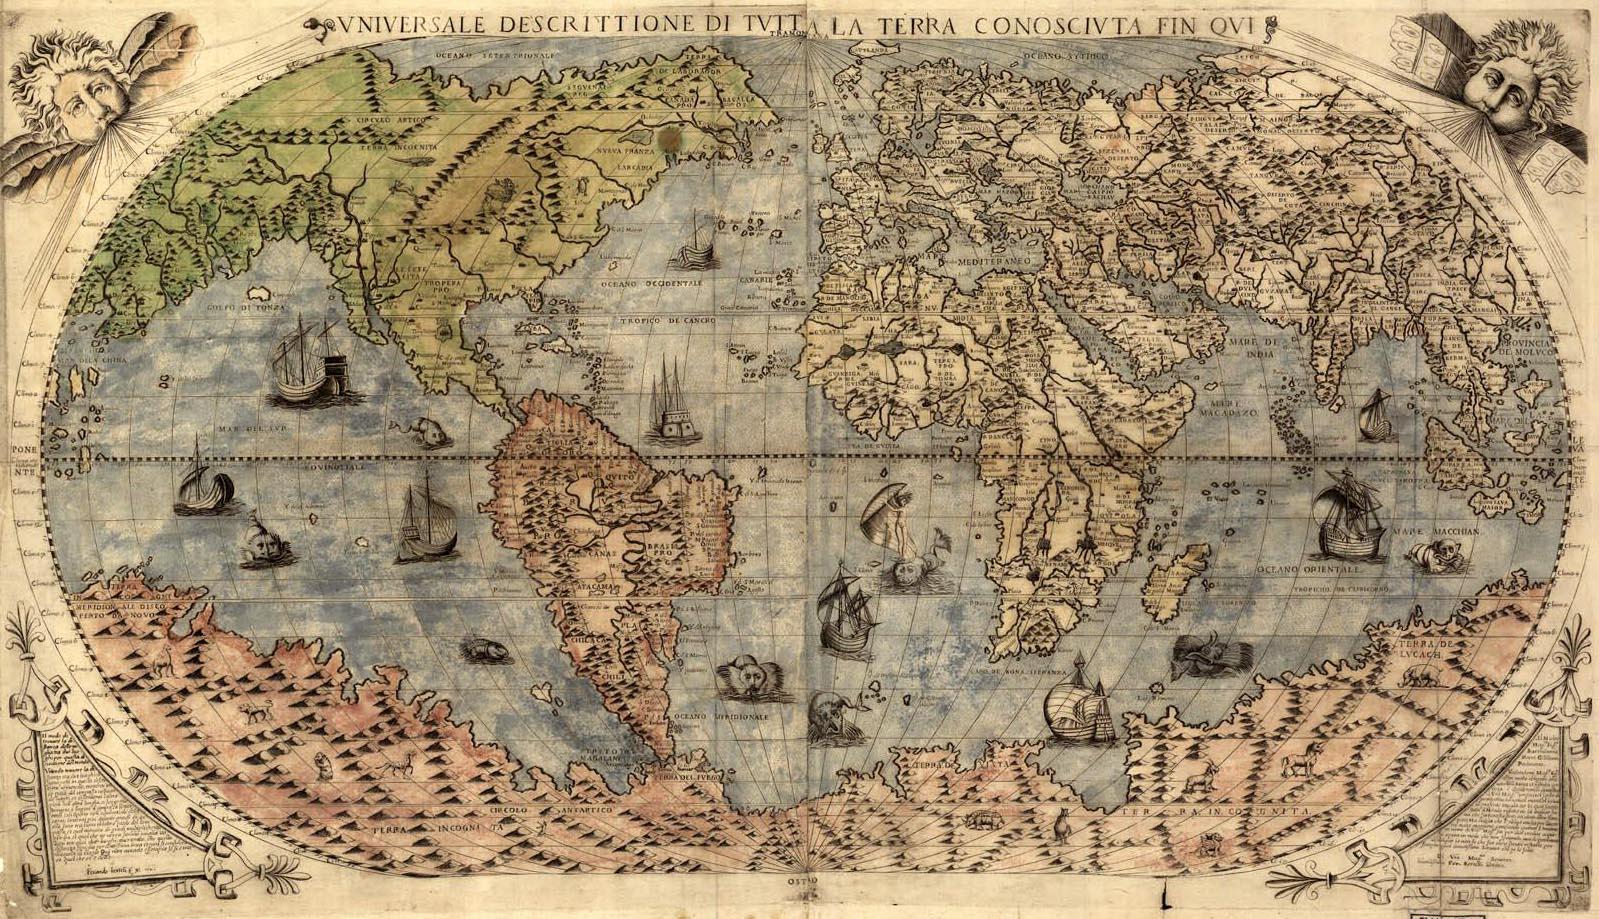 DREAM WALLPAPER Antique Map Wallpaper 1599x919